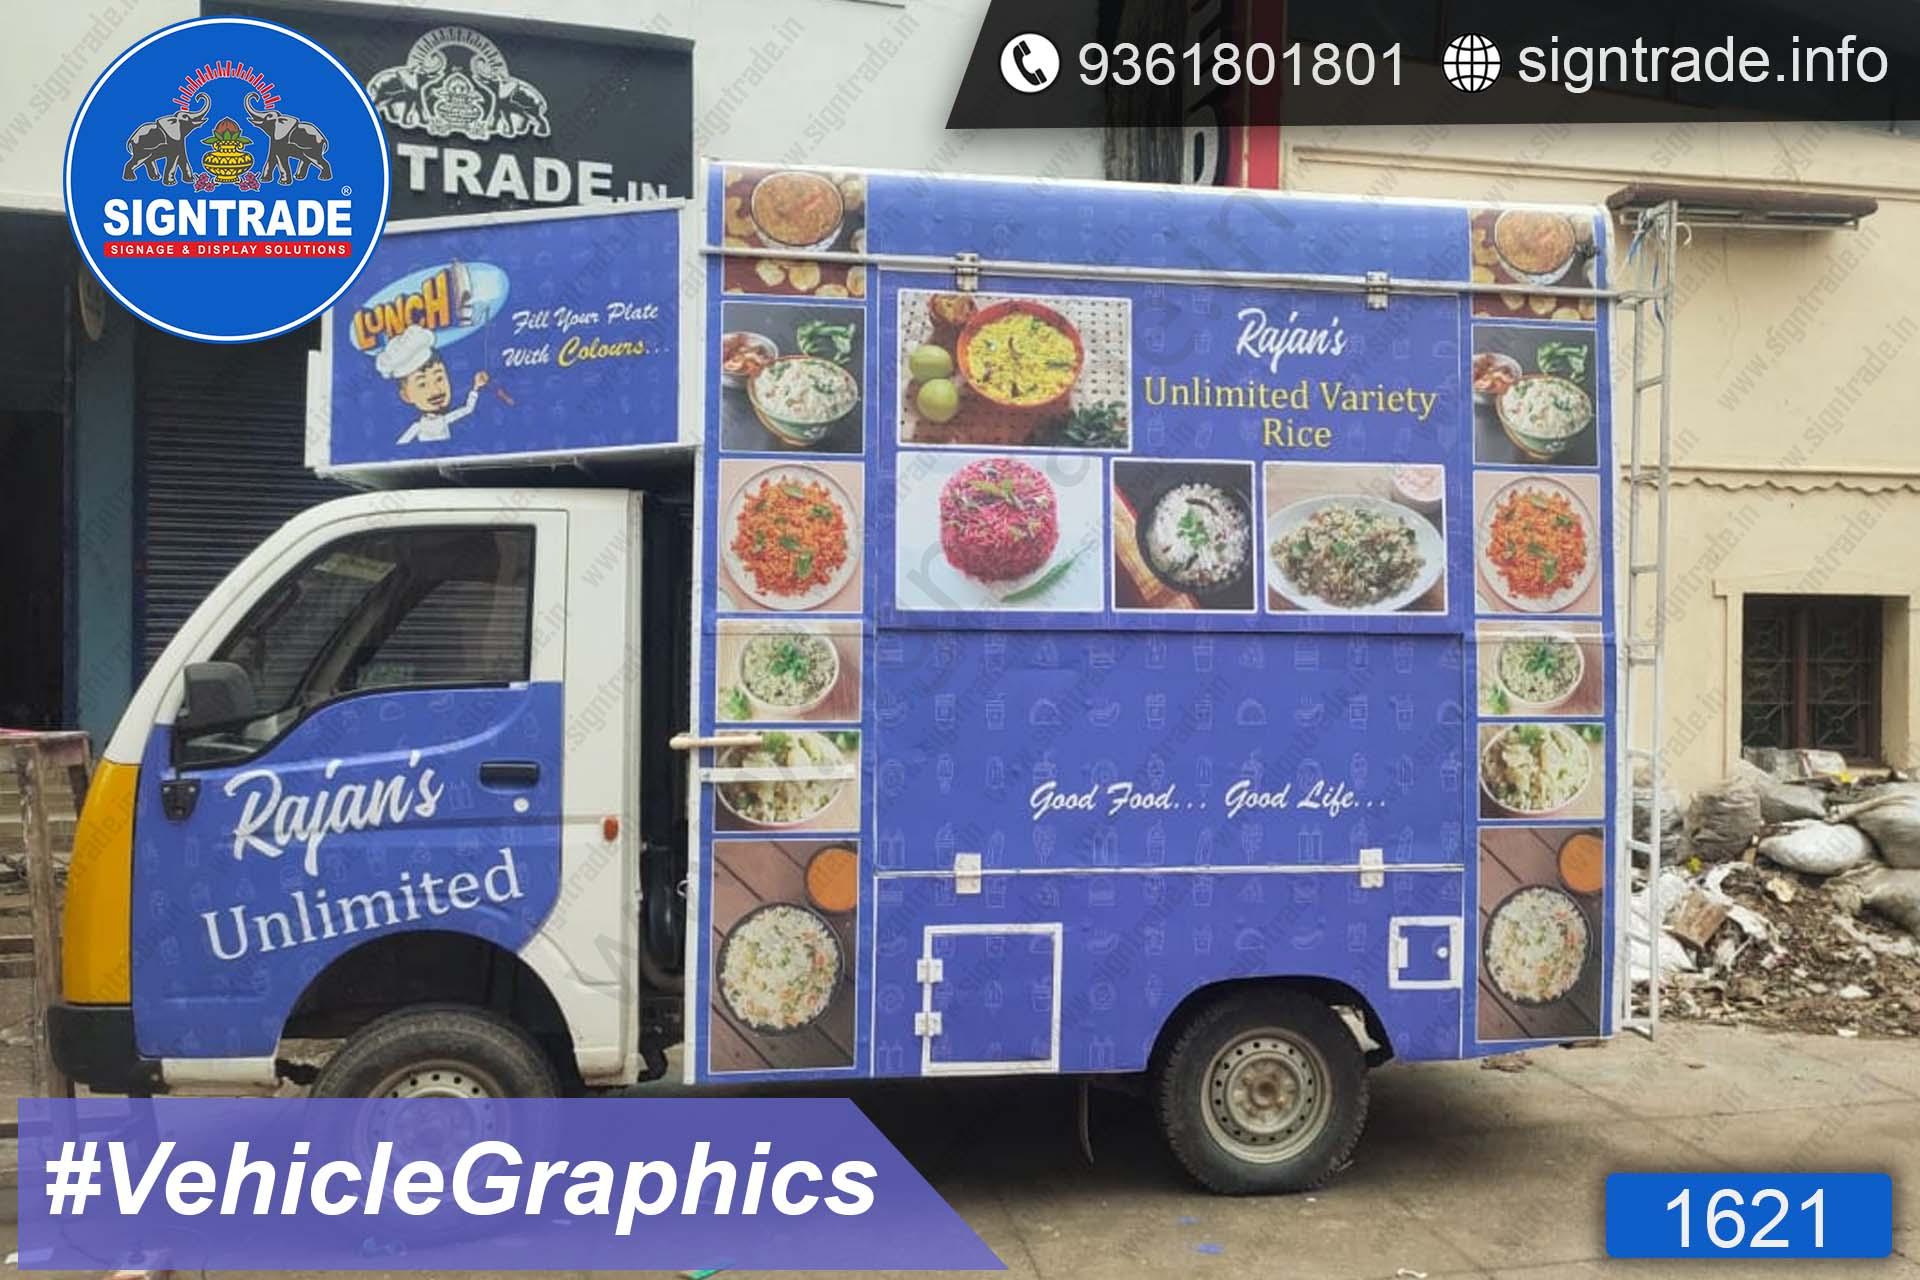 Rajan's Unlimited Variety Rice - Van Graphics - SIGNTRADE - Vinyl Printing, Van Graphics in Service in Chennai